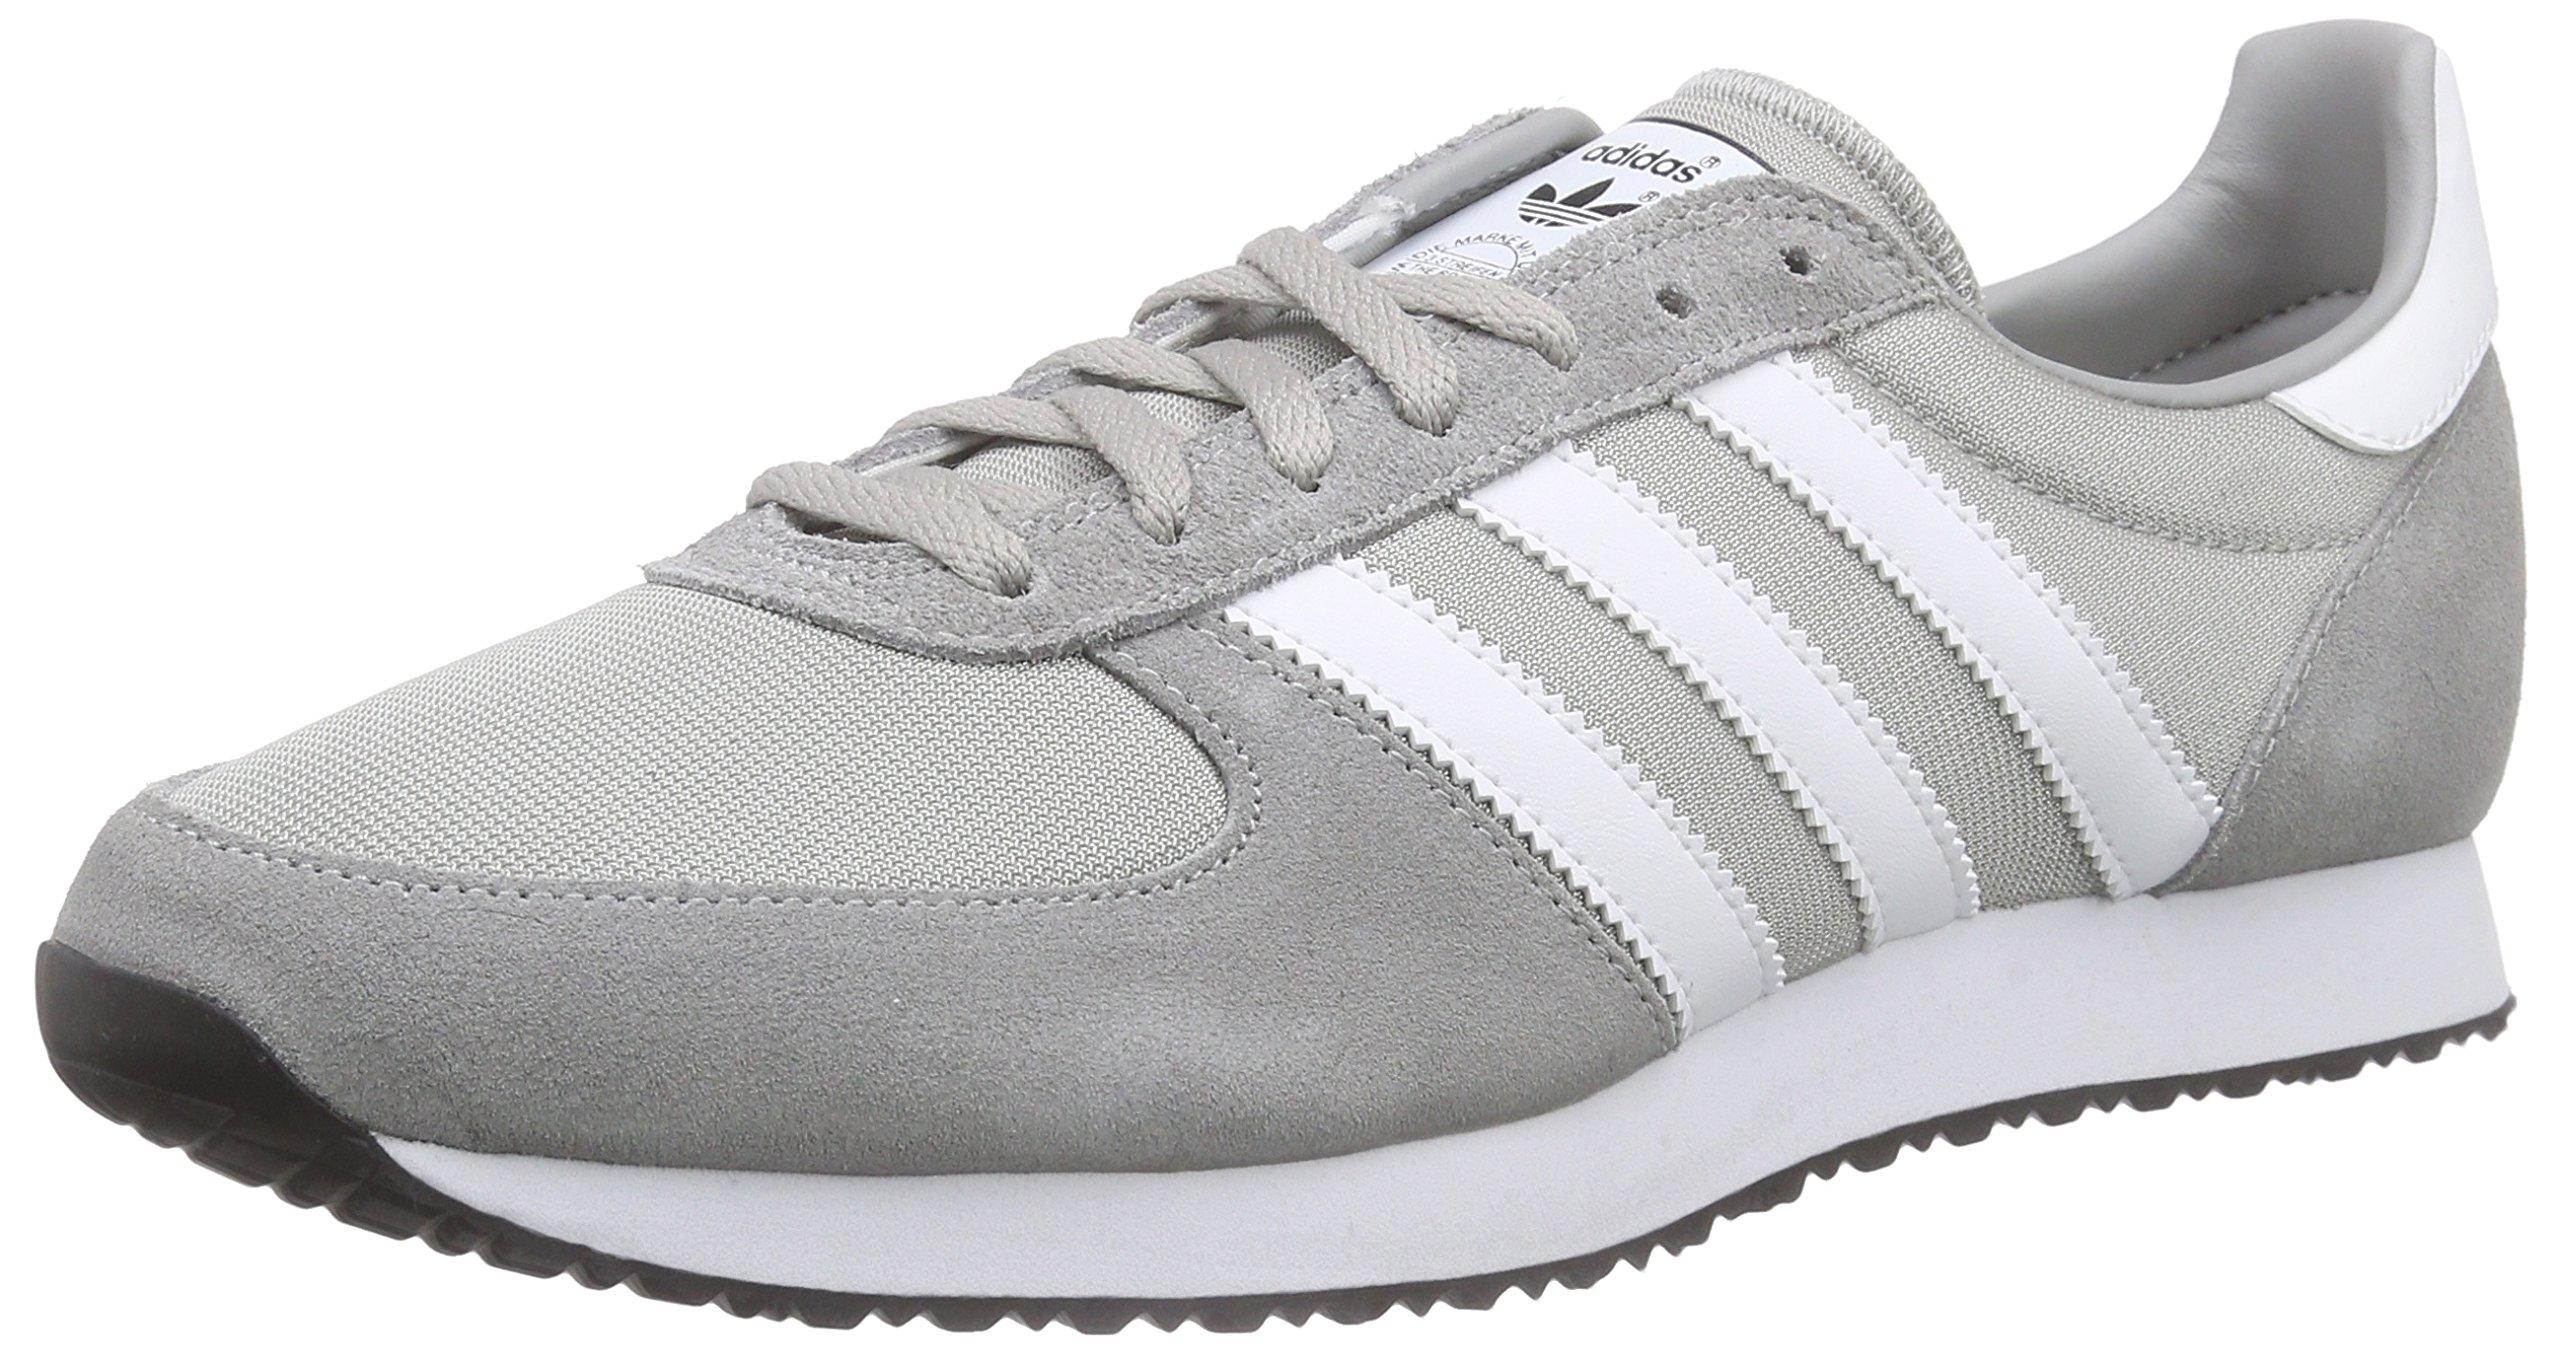 Grey core HommeGrismgh White Zx RacerBaskets Basses Black46 ftwr Solid Adidas Eu trdQhCs